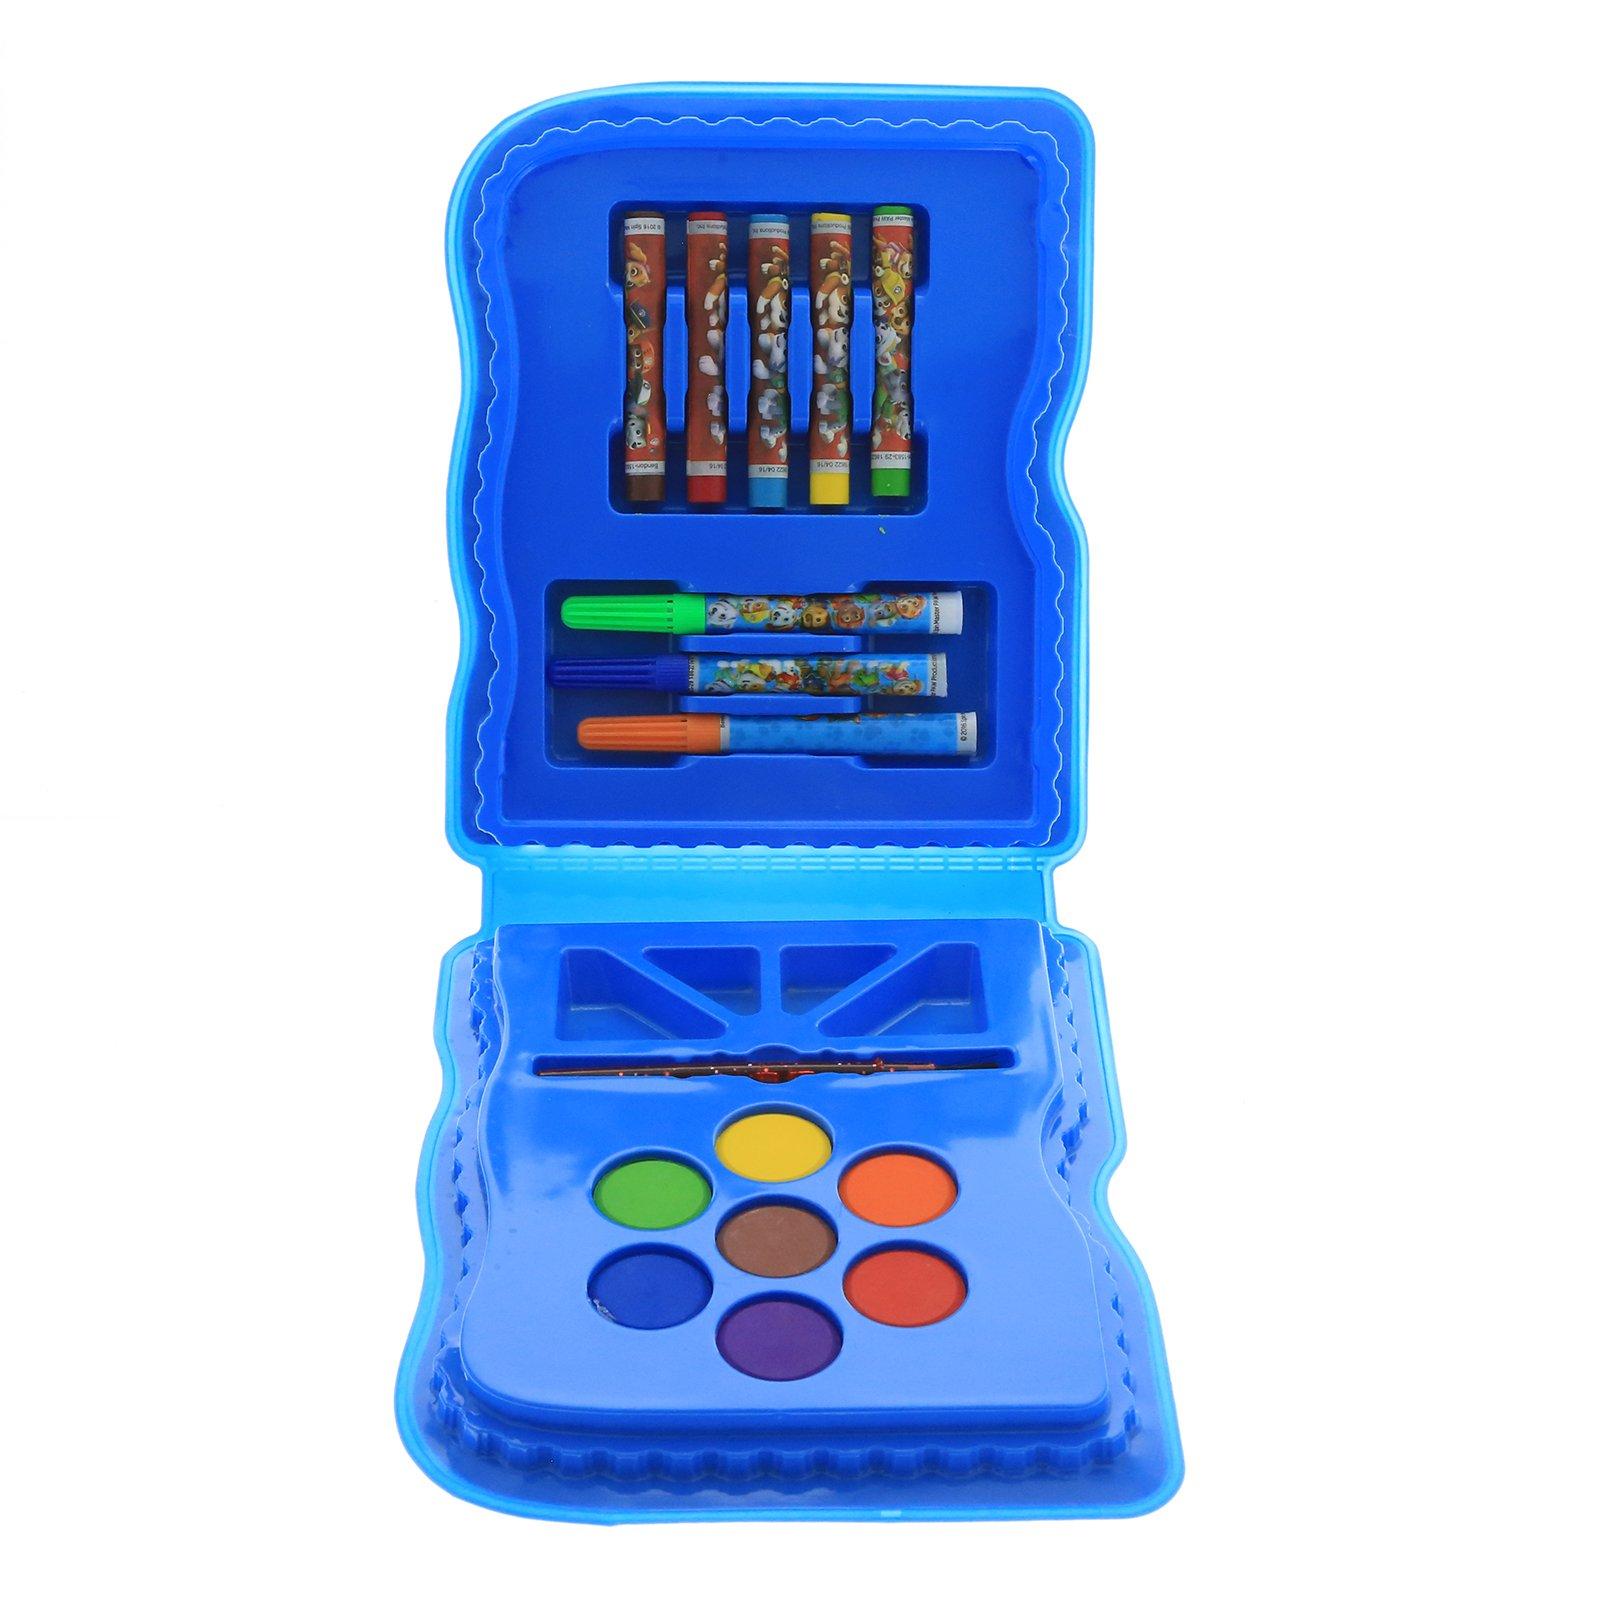 Nickelodeon Paw Patrol Kids Art Case 16pc Arts and Crafts Kit - Blue